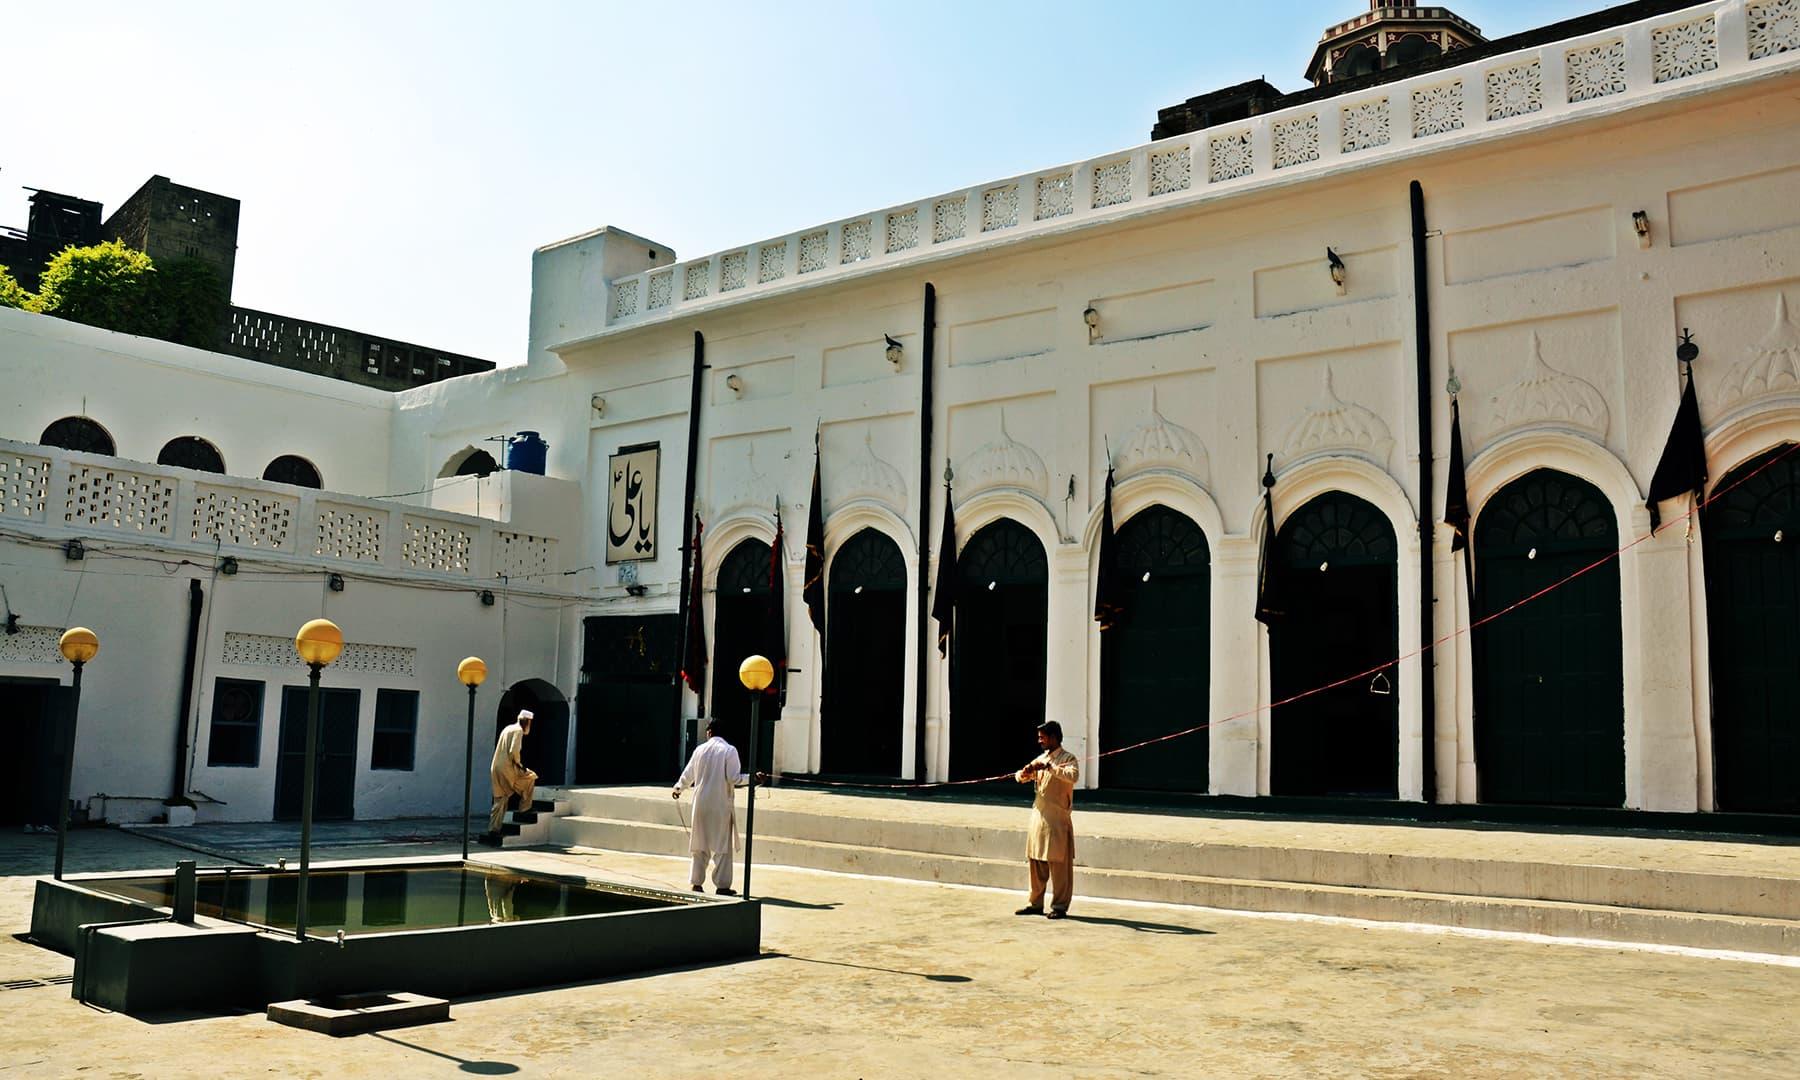 Mubarik 'haveli' Imambargah. —Photo by Abdullah Khan